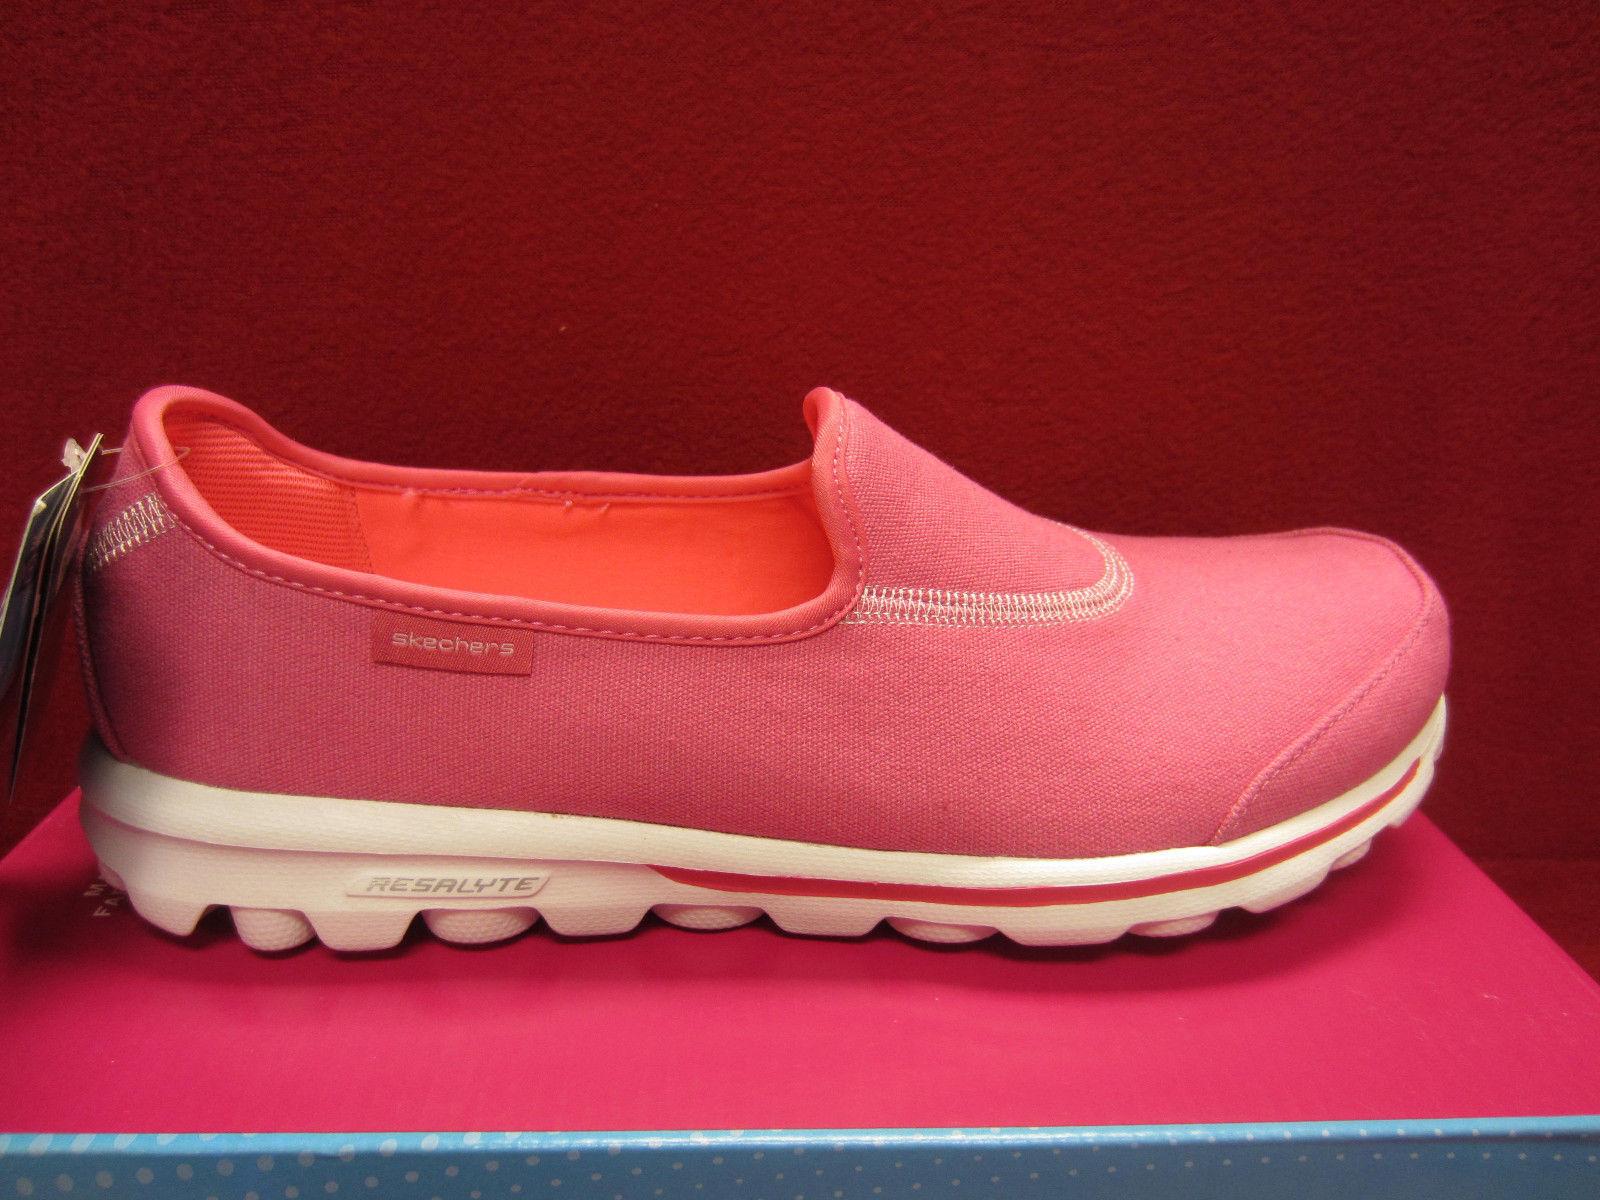 New Skechers GOwalk Extend 13771 HPK, hot Rosa, Größe 7 1 2